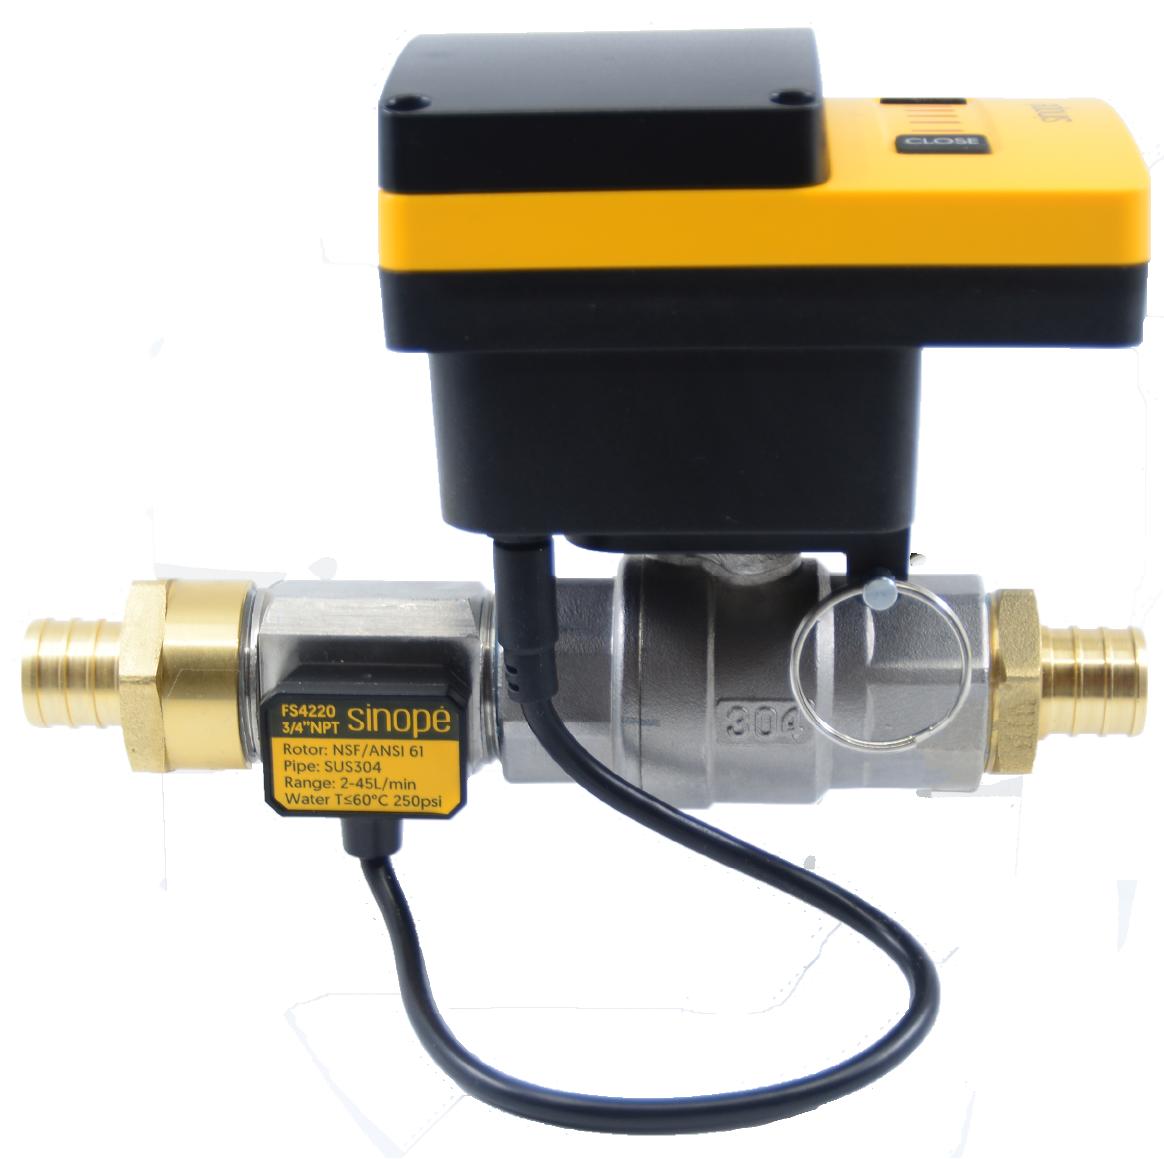 Sedna smart water valve with flow sensor - PEX ready